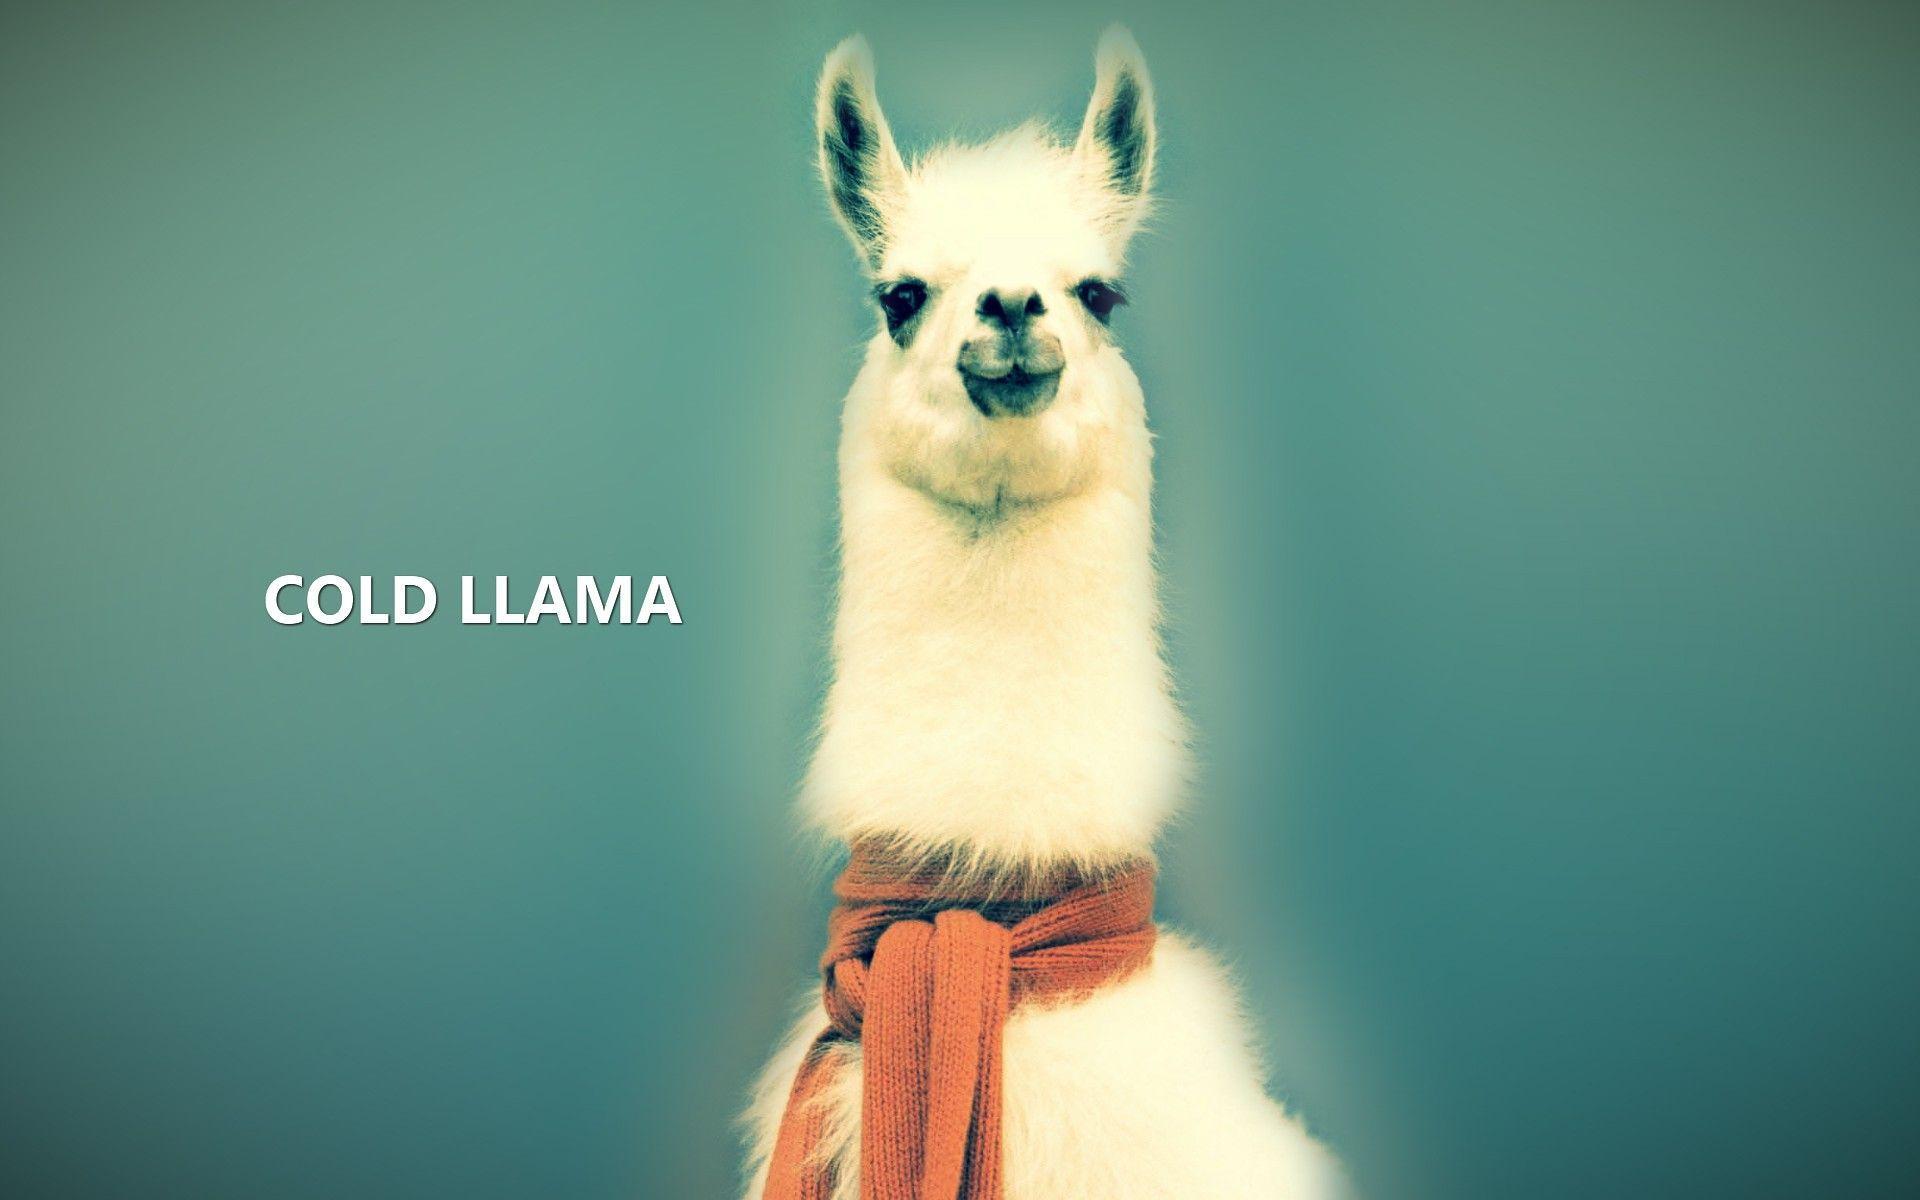 Cute Llama Wallpaper Desktop Llama Backgrounds Wallpaper Cave